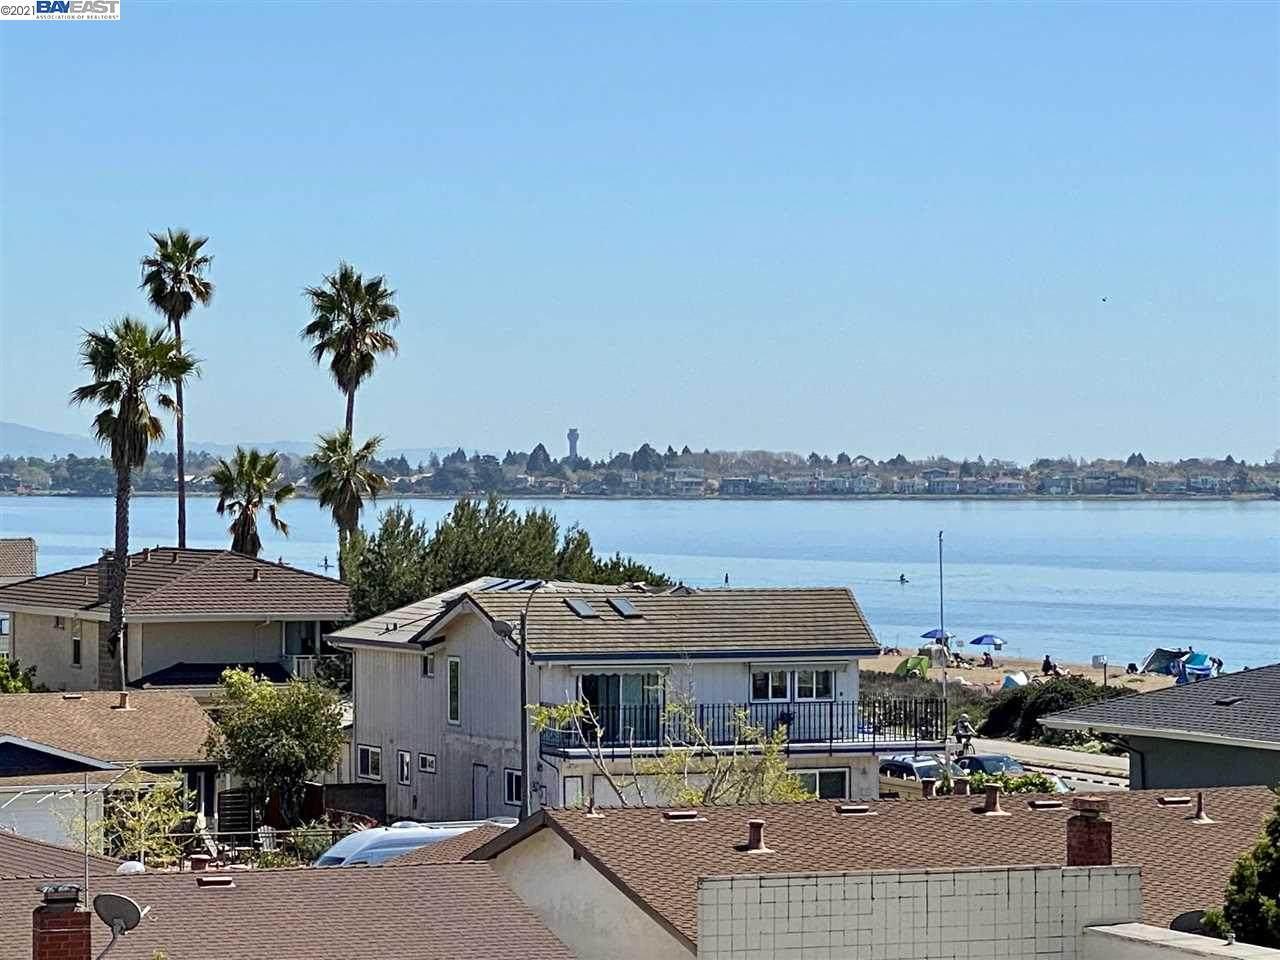 960 Shorepoint Ct 318 - Photo 1